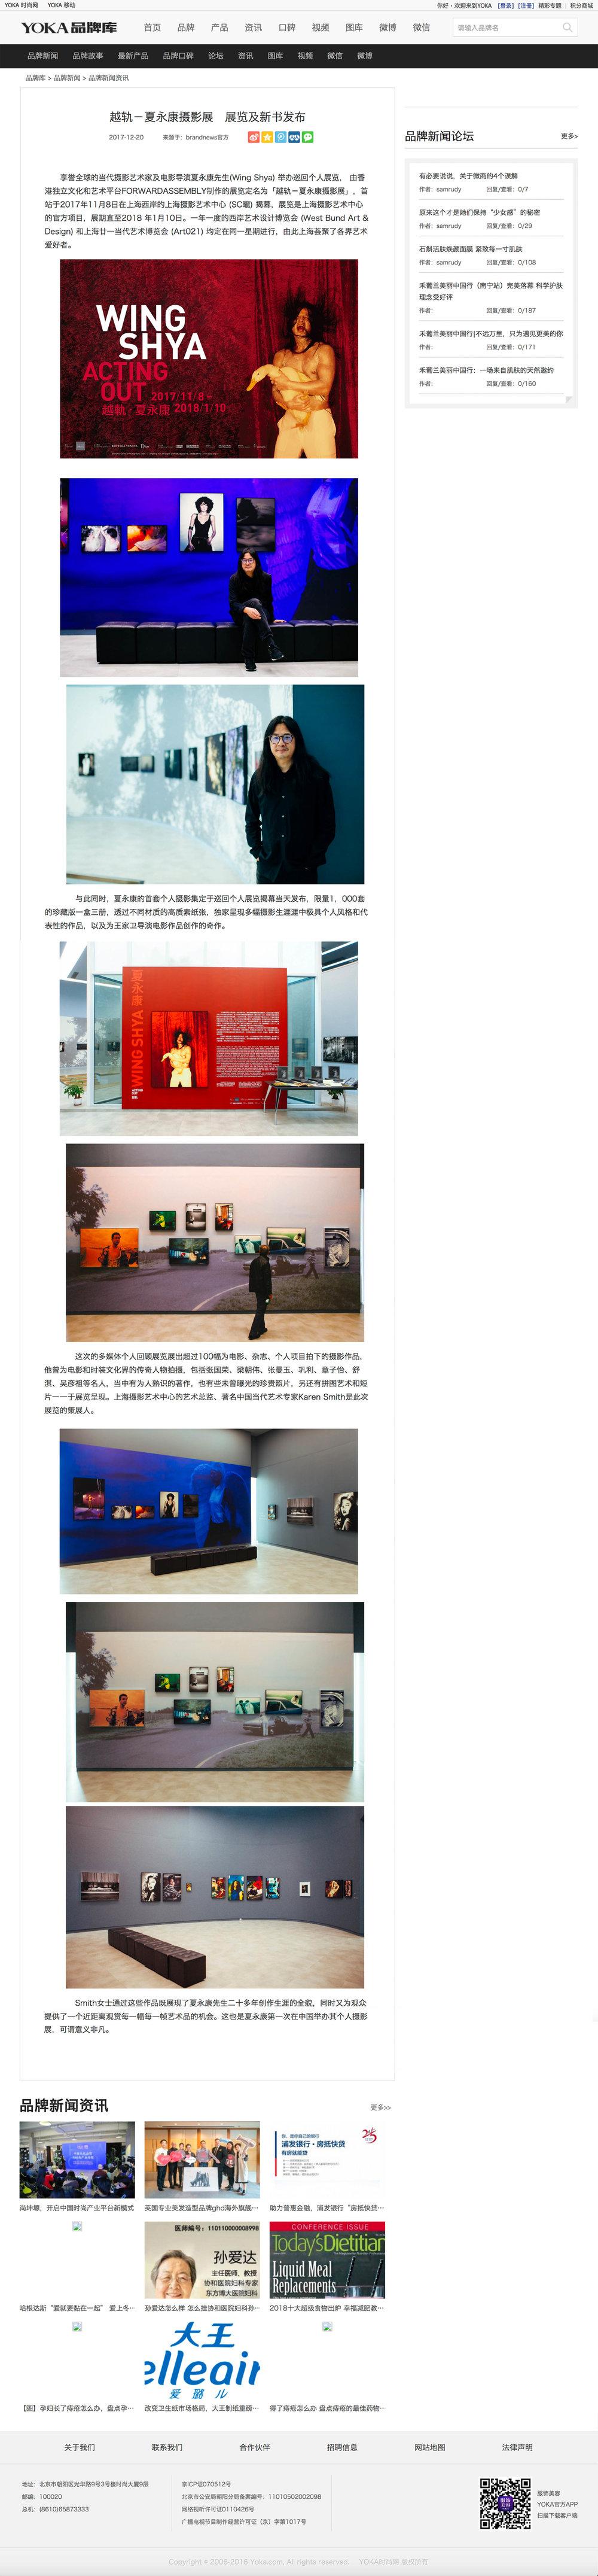 YOKA.com.jpg